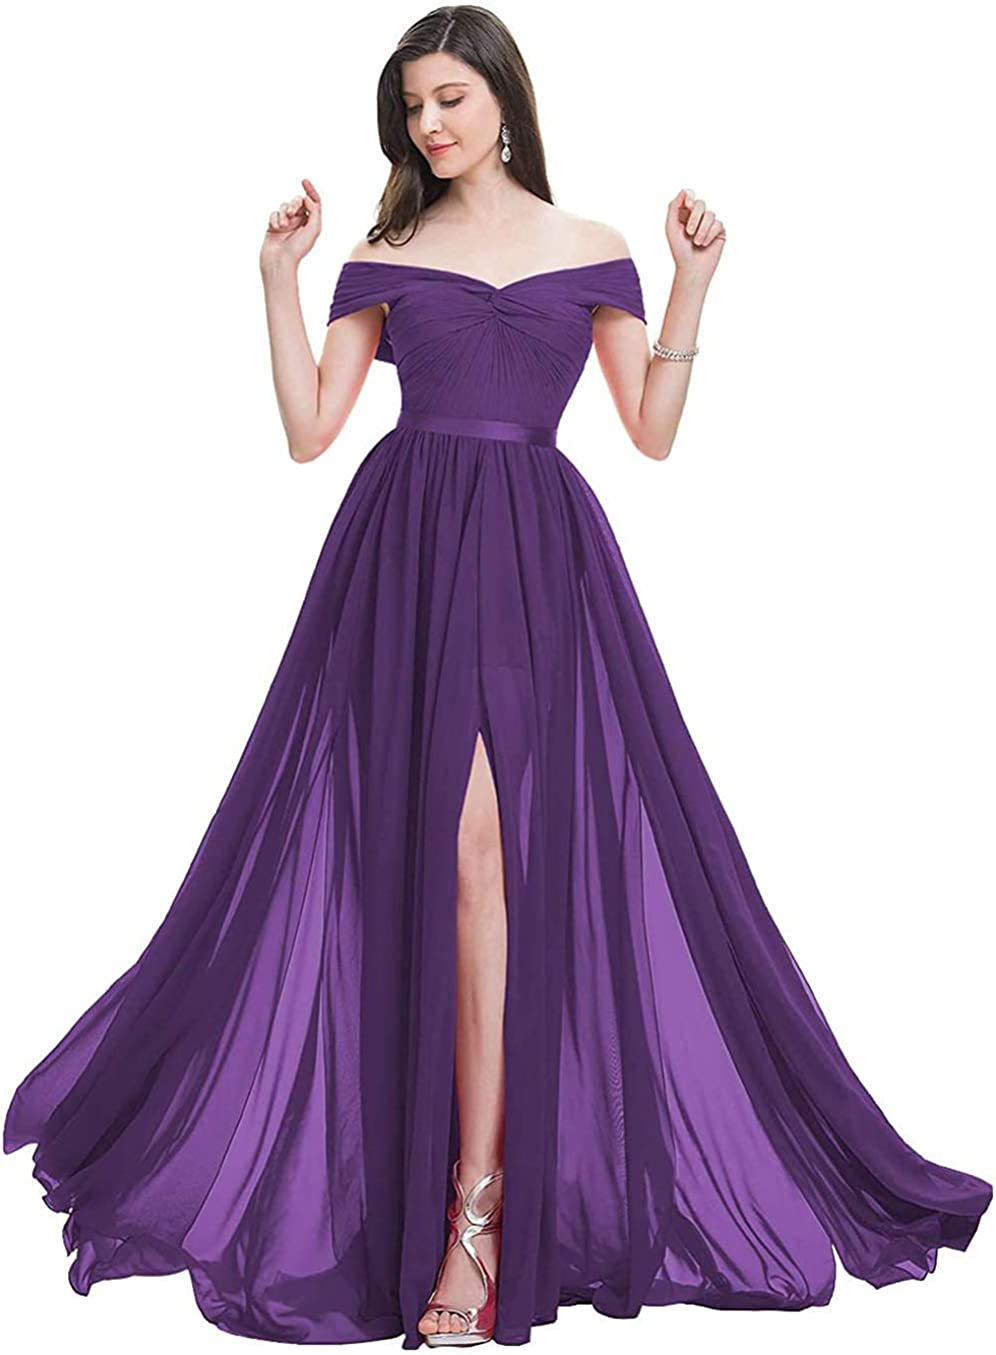 AKHOKA Women's Off Shoulder Bridesmaid Dresses Chiffon Slit Prom Formal Wedding Dress